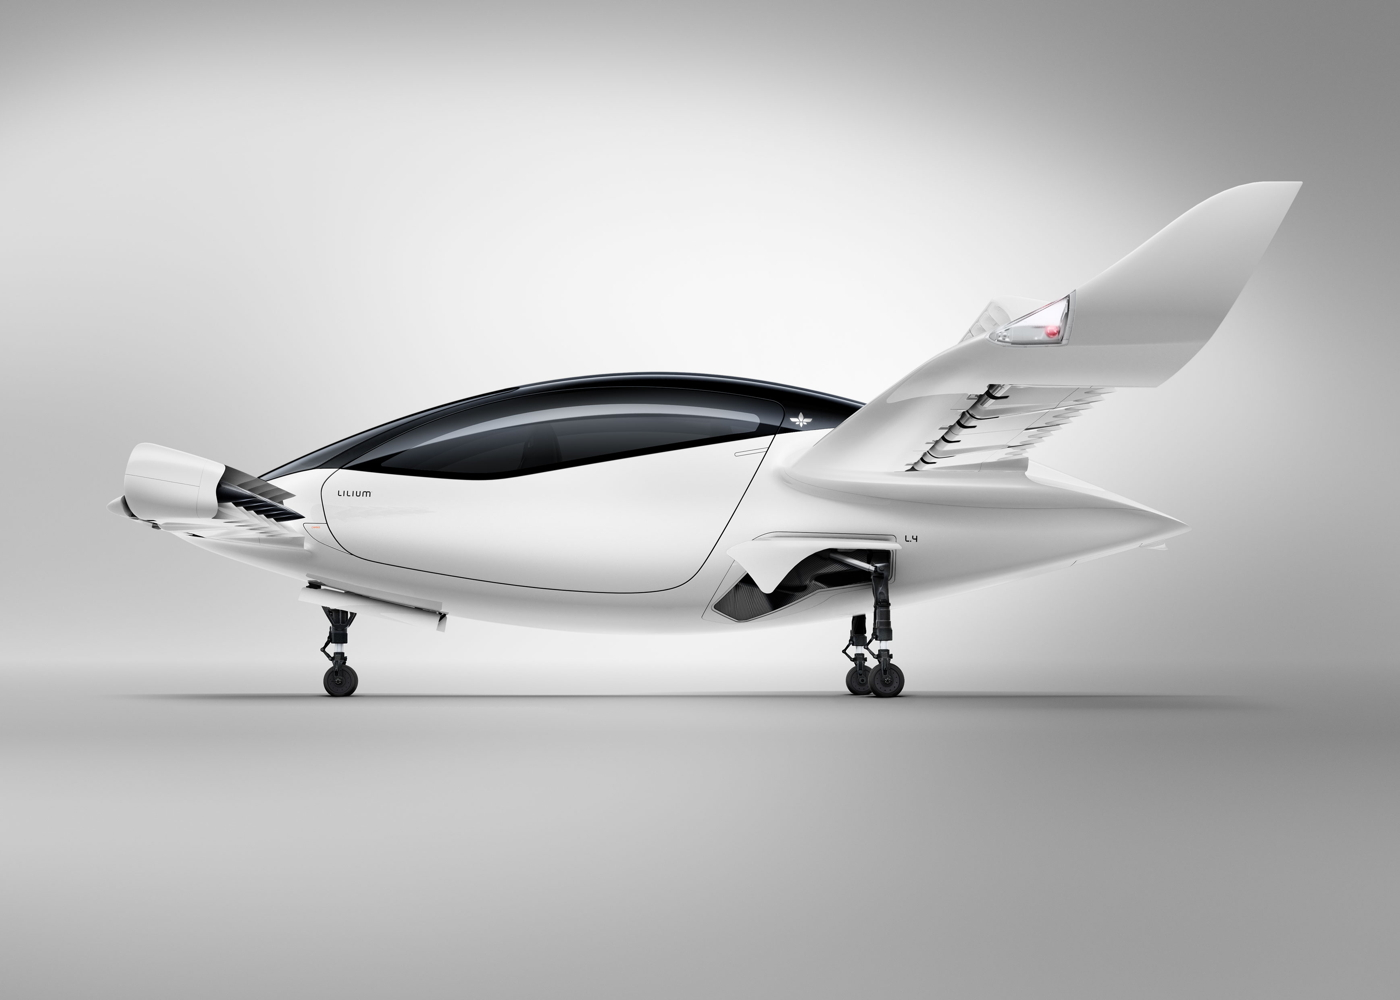 Lilium Jet eVTOL air taxi